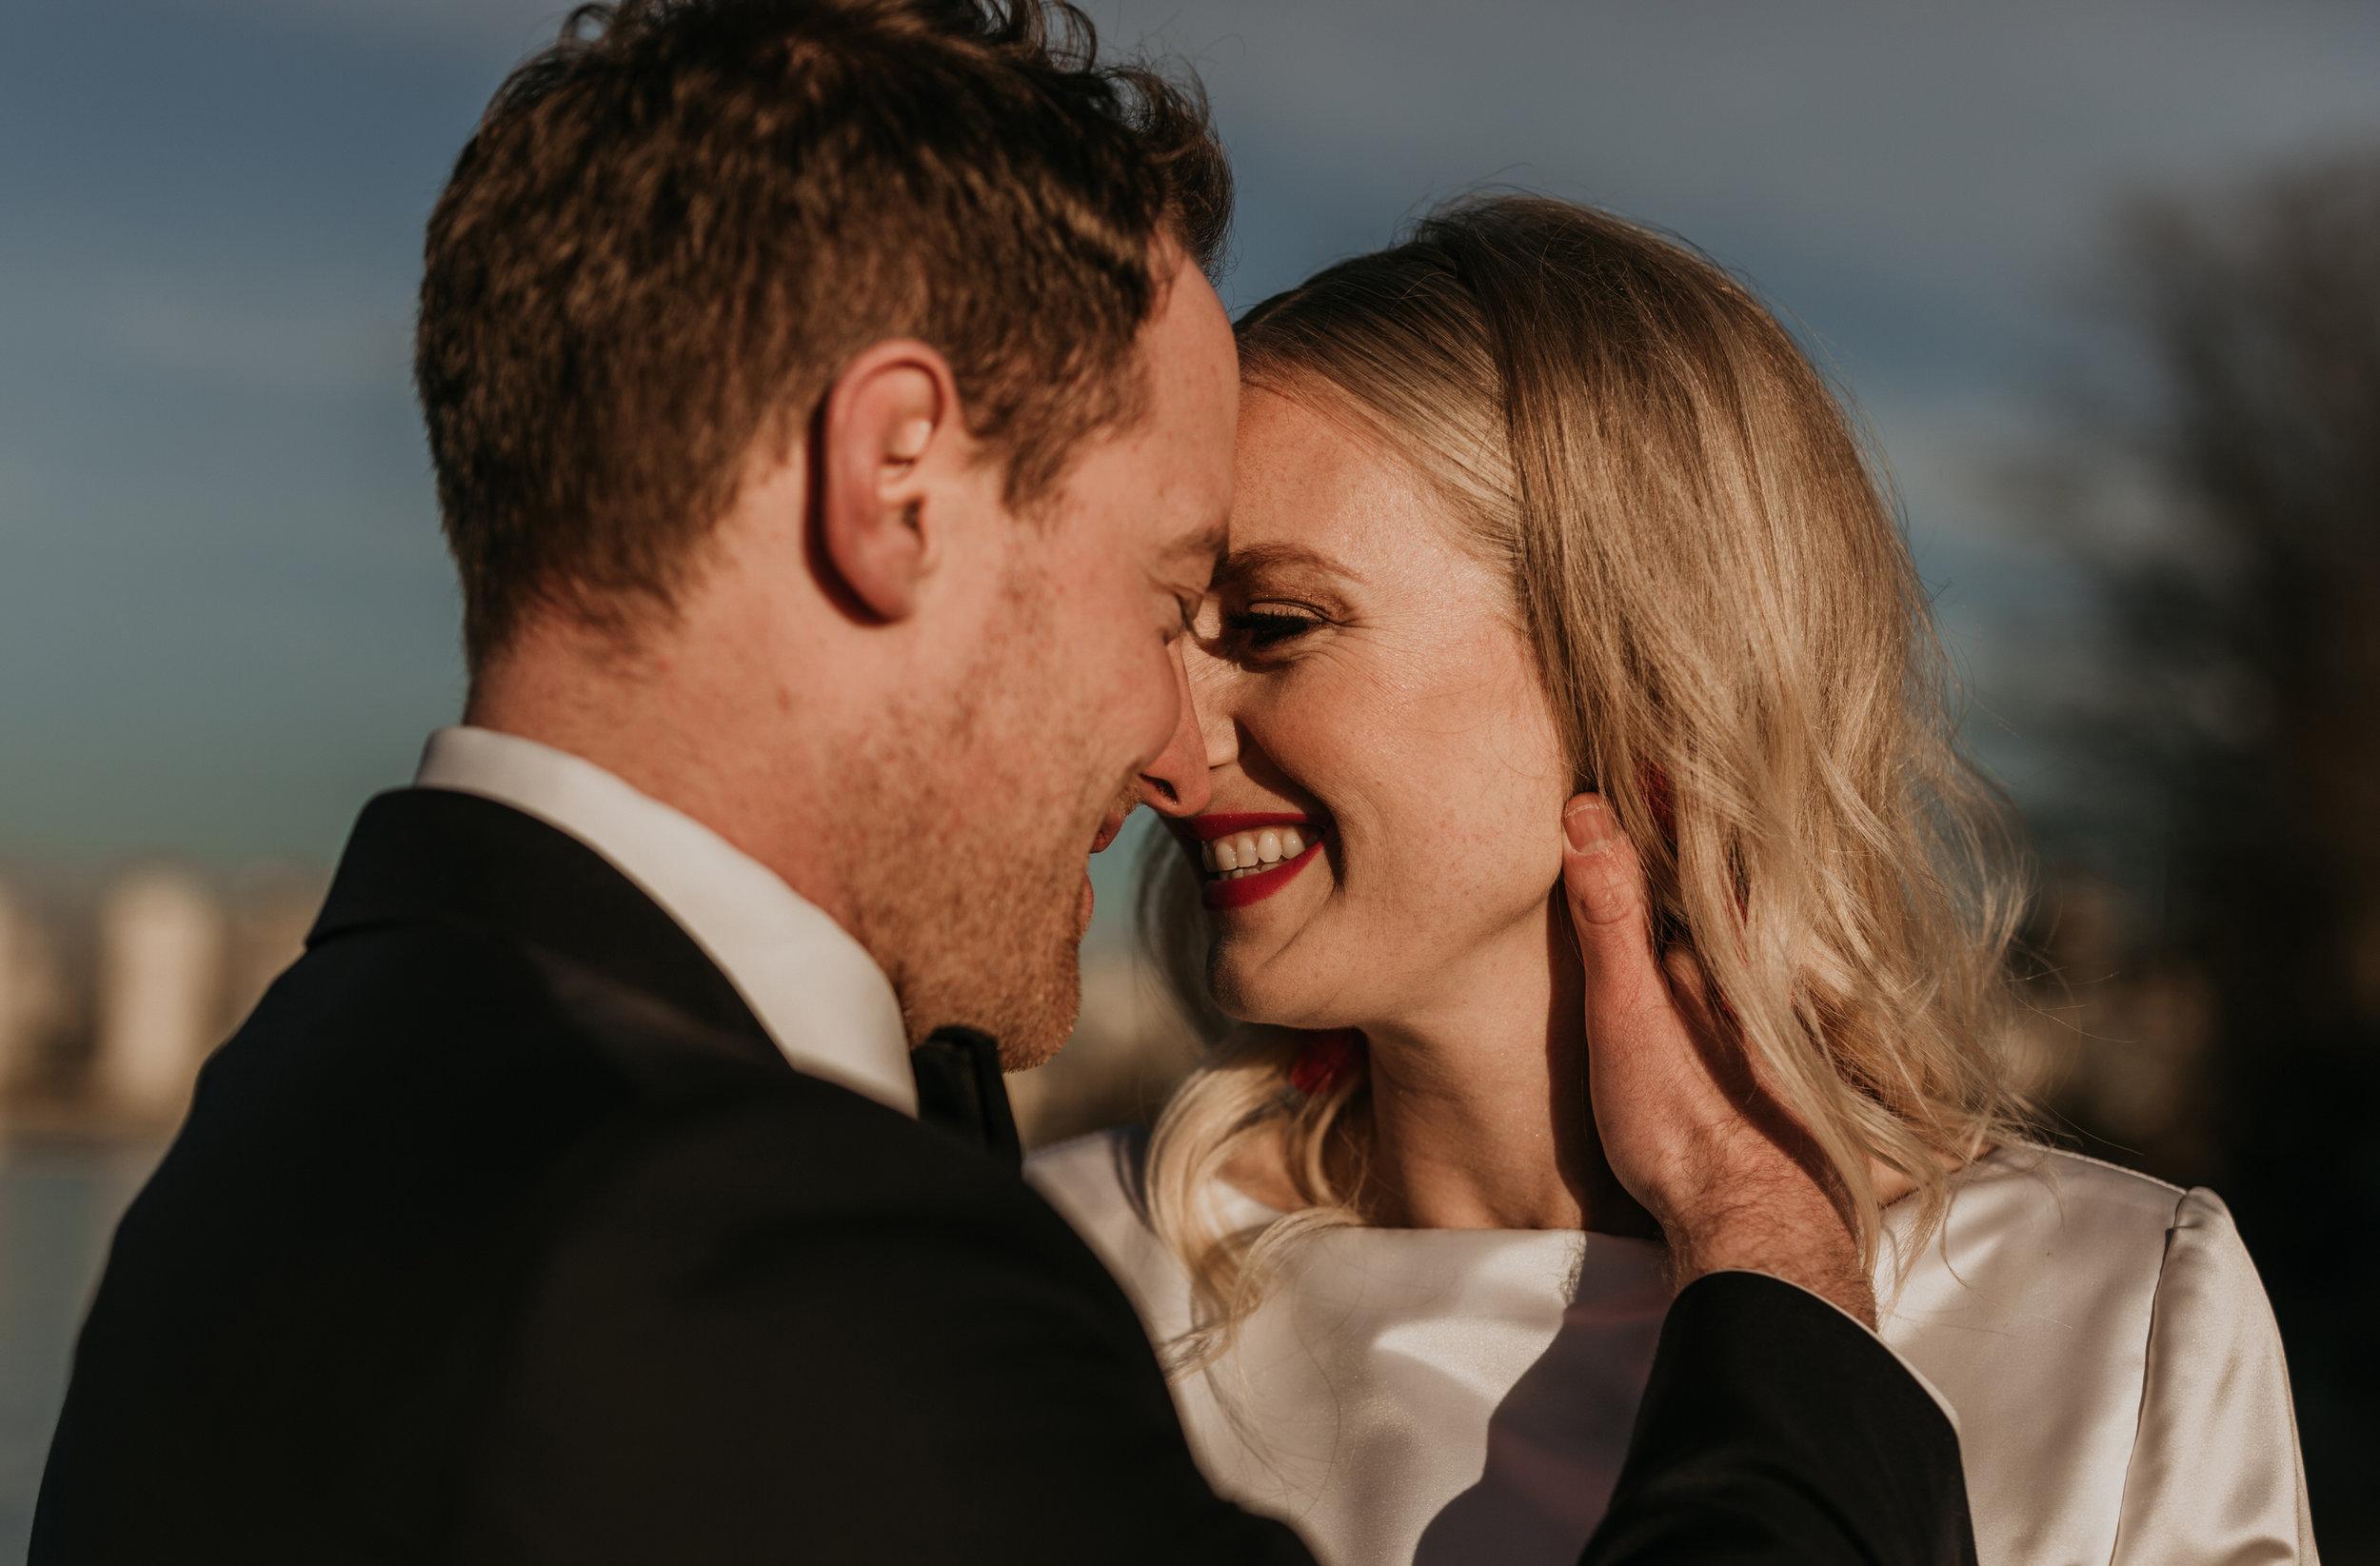 Vancouver Wedding Photos - Vegan Wedding Photographer - New Years Eve Wedding Photos - Vancouver Wedding Photographer - Vancouver Wedding Videographer - 631.JPG